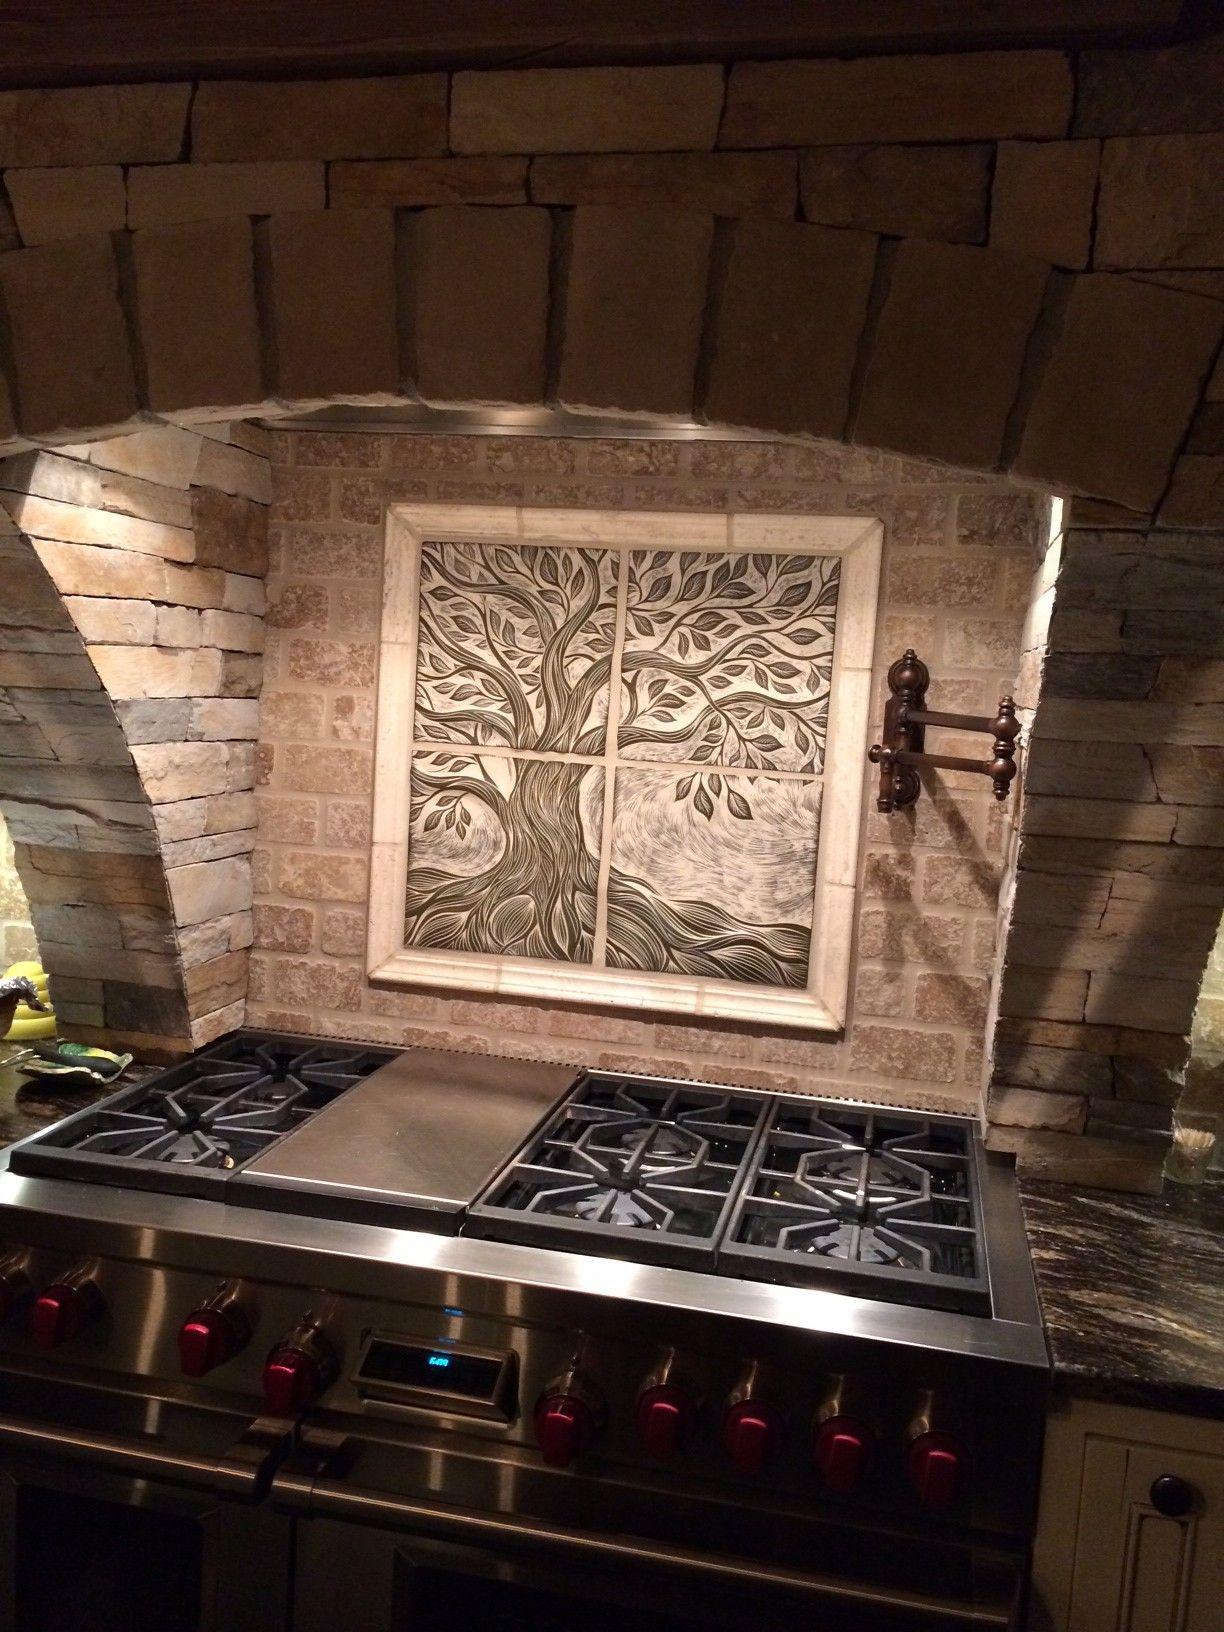 Handmade sgraffito carved ceramic backsplash tile the for Ceramic tile kitchen backsplash ideas